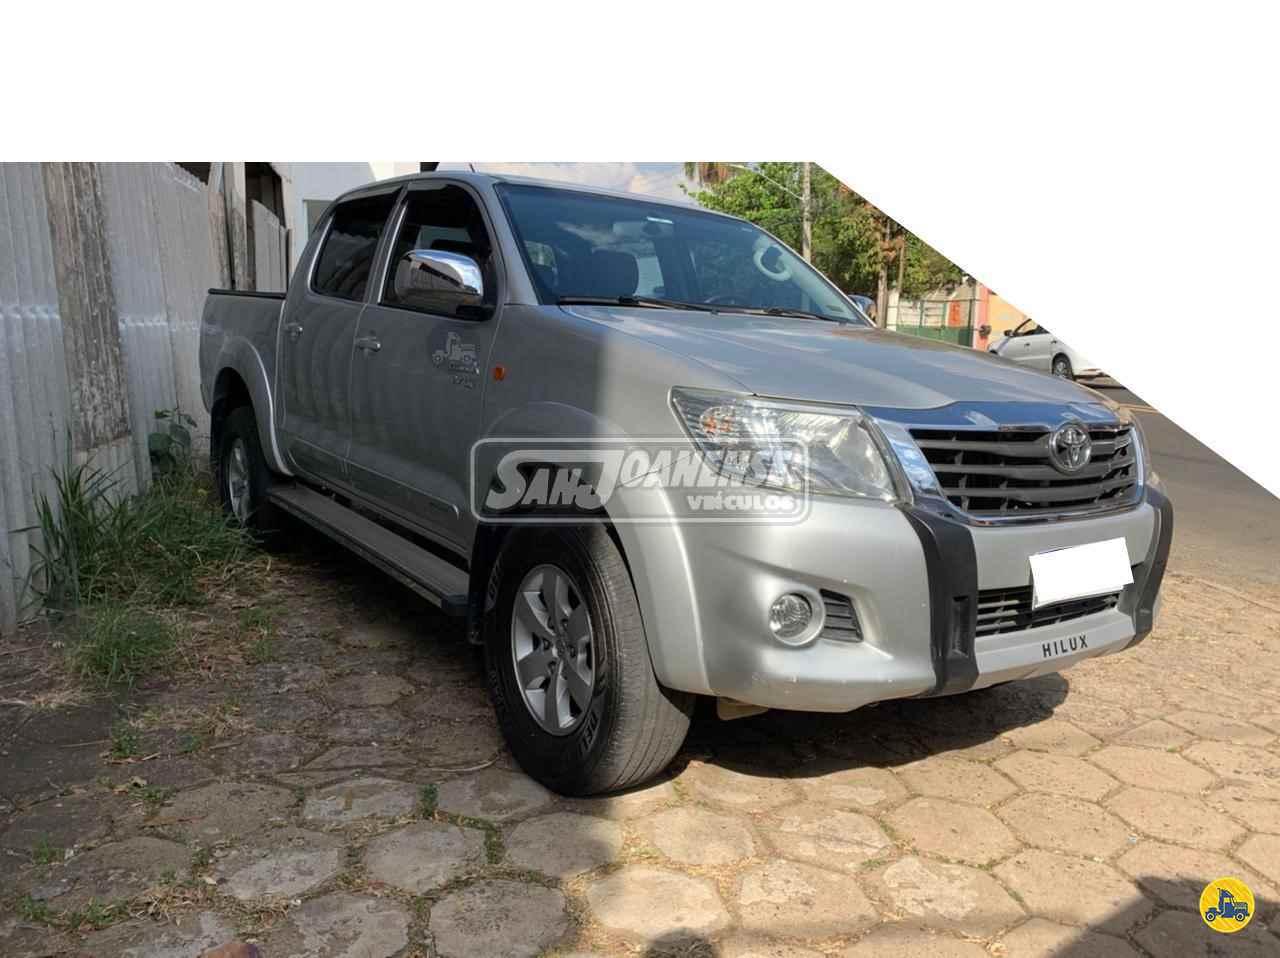 CARRO TOYOTA Hilux 2.7 SRV Sanjoanense Veículos SAO JOAO DA BOA VISTA SÃO PAULO SP